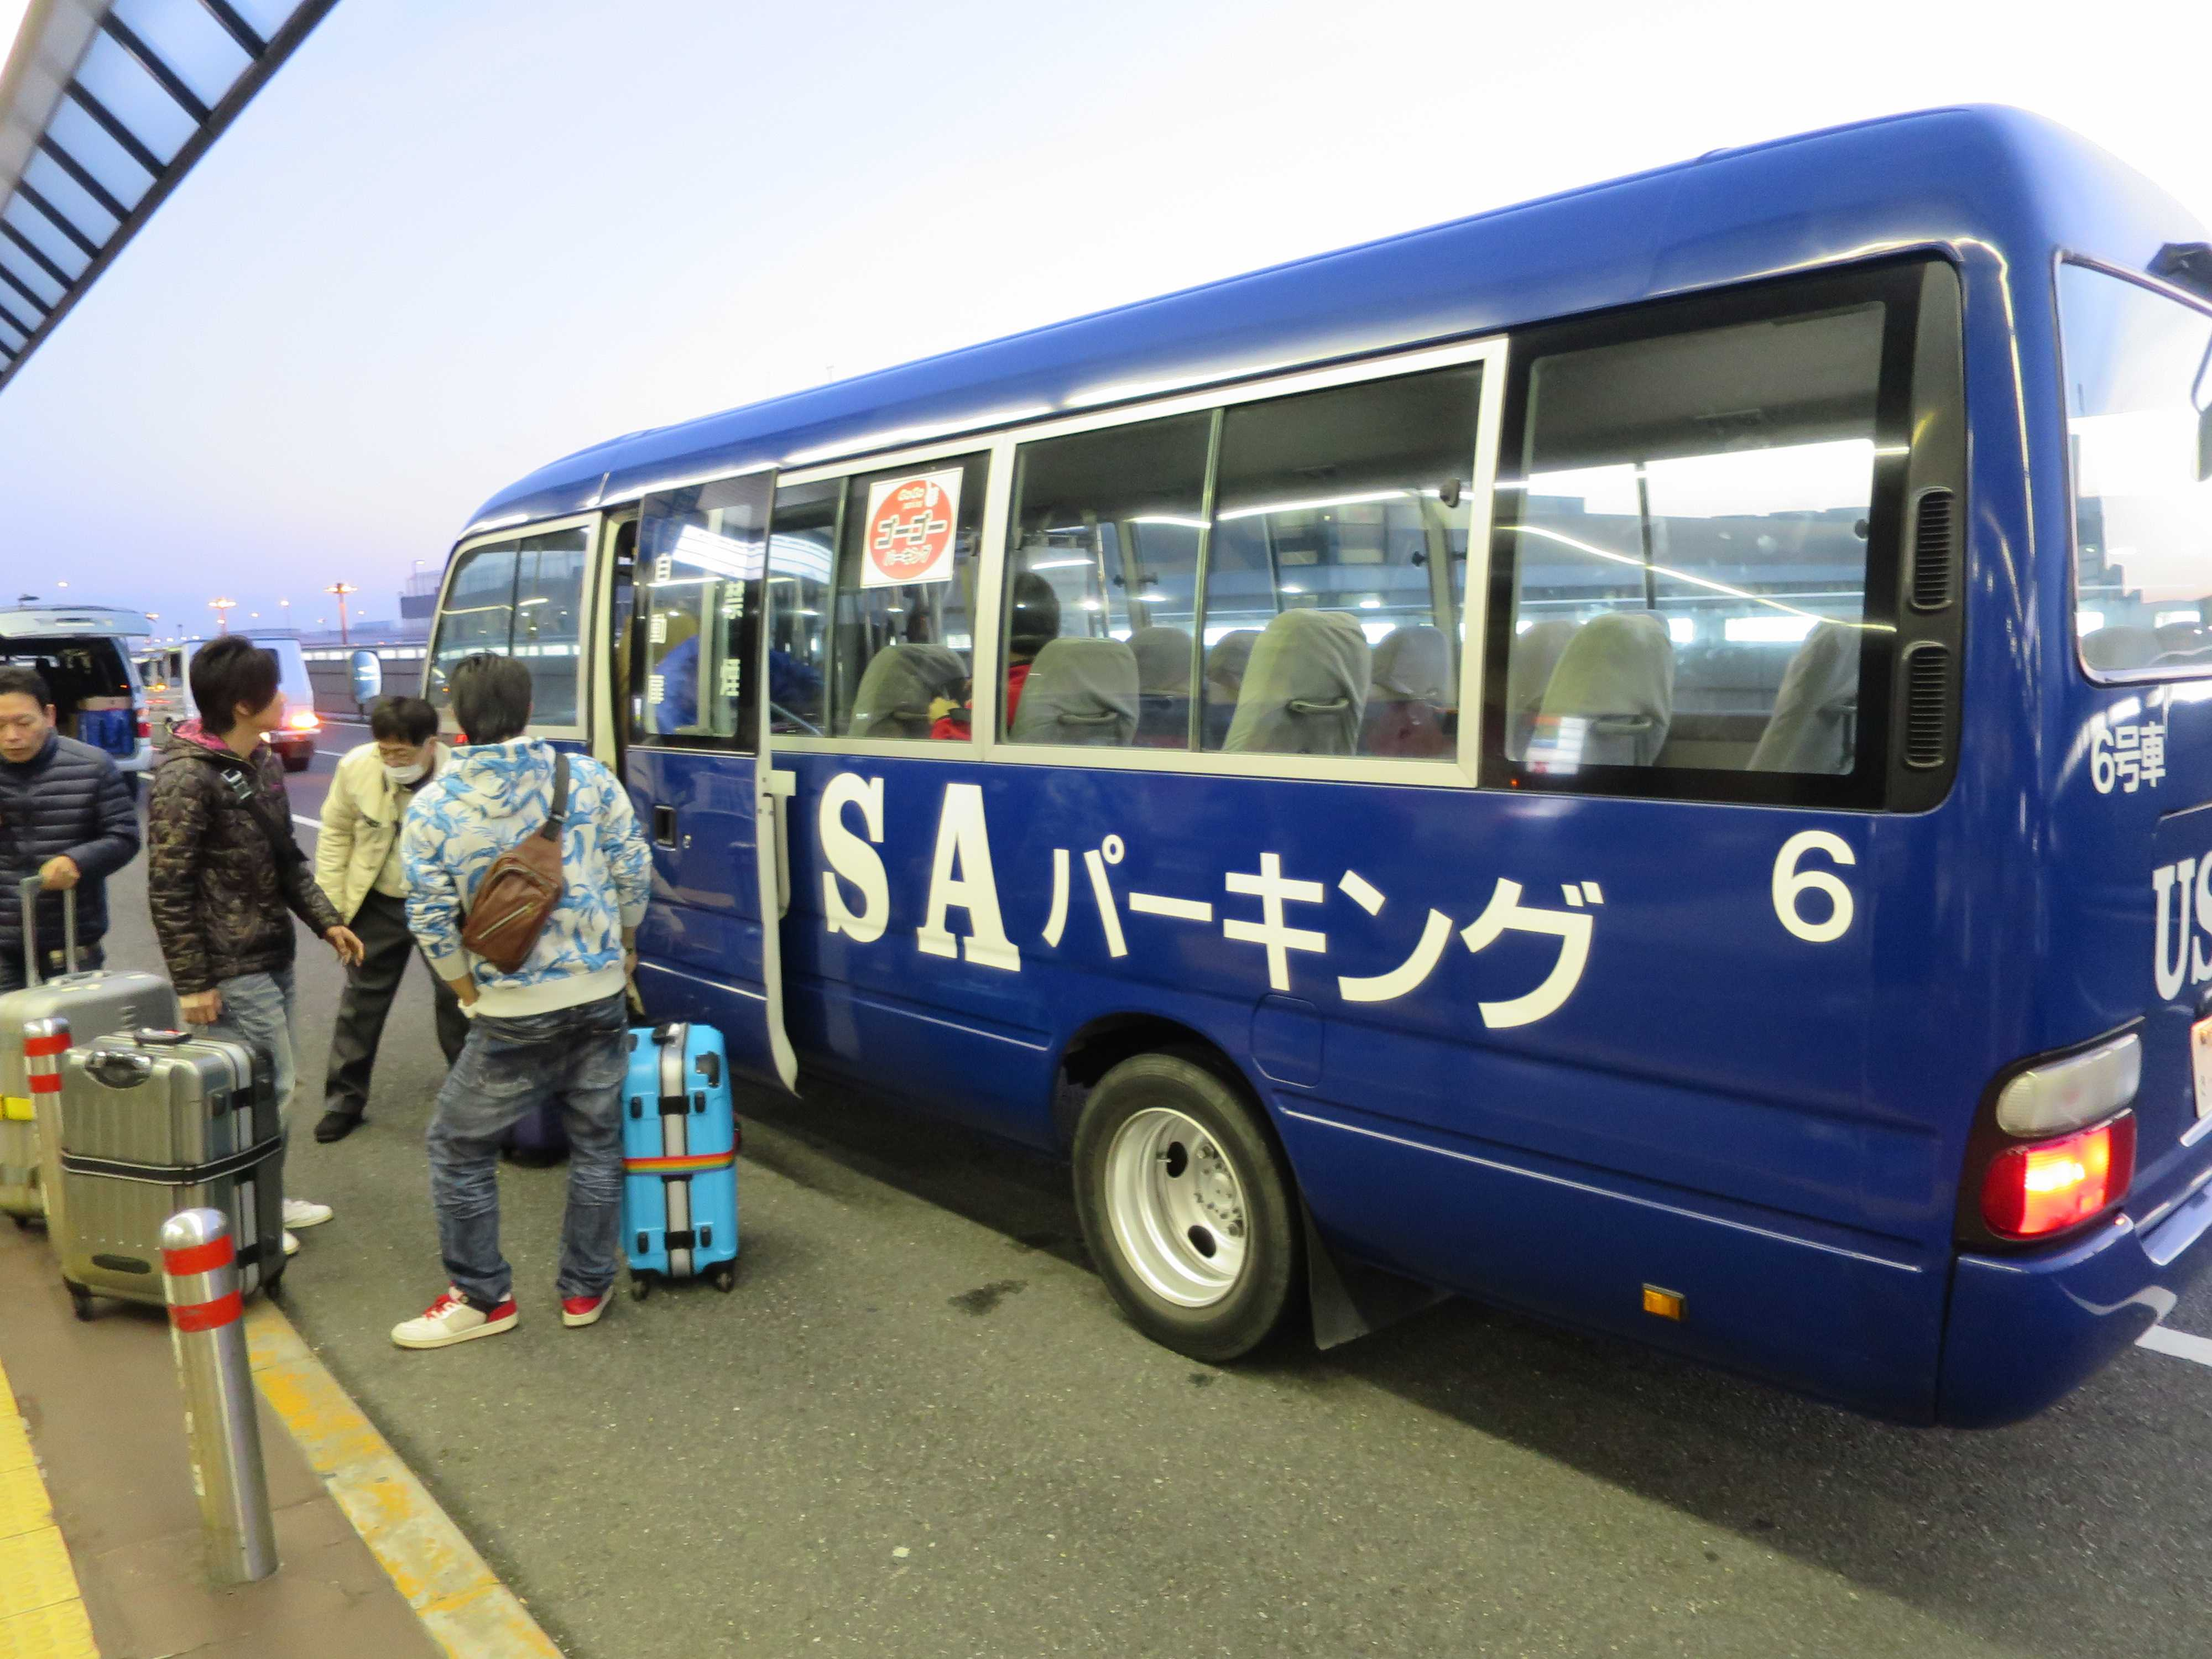 USAパーキング 送迎バス